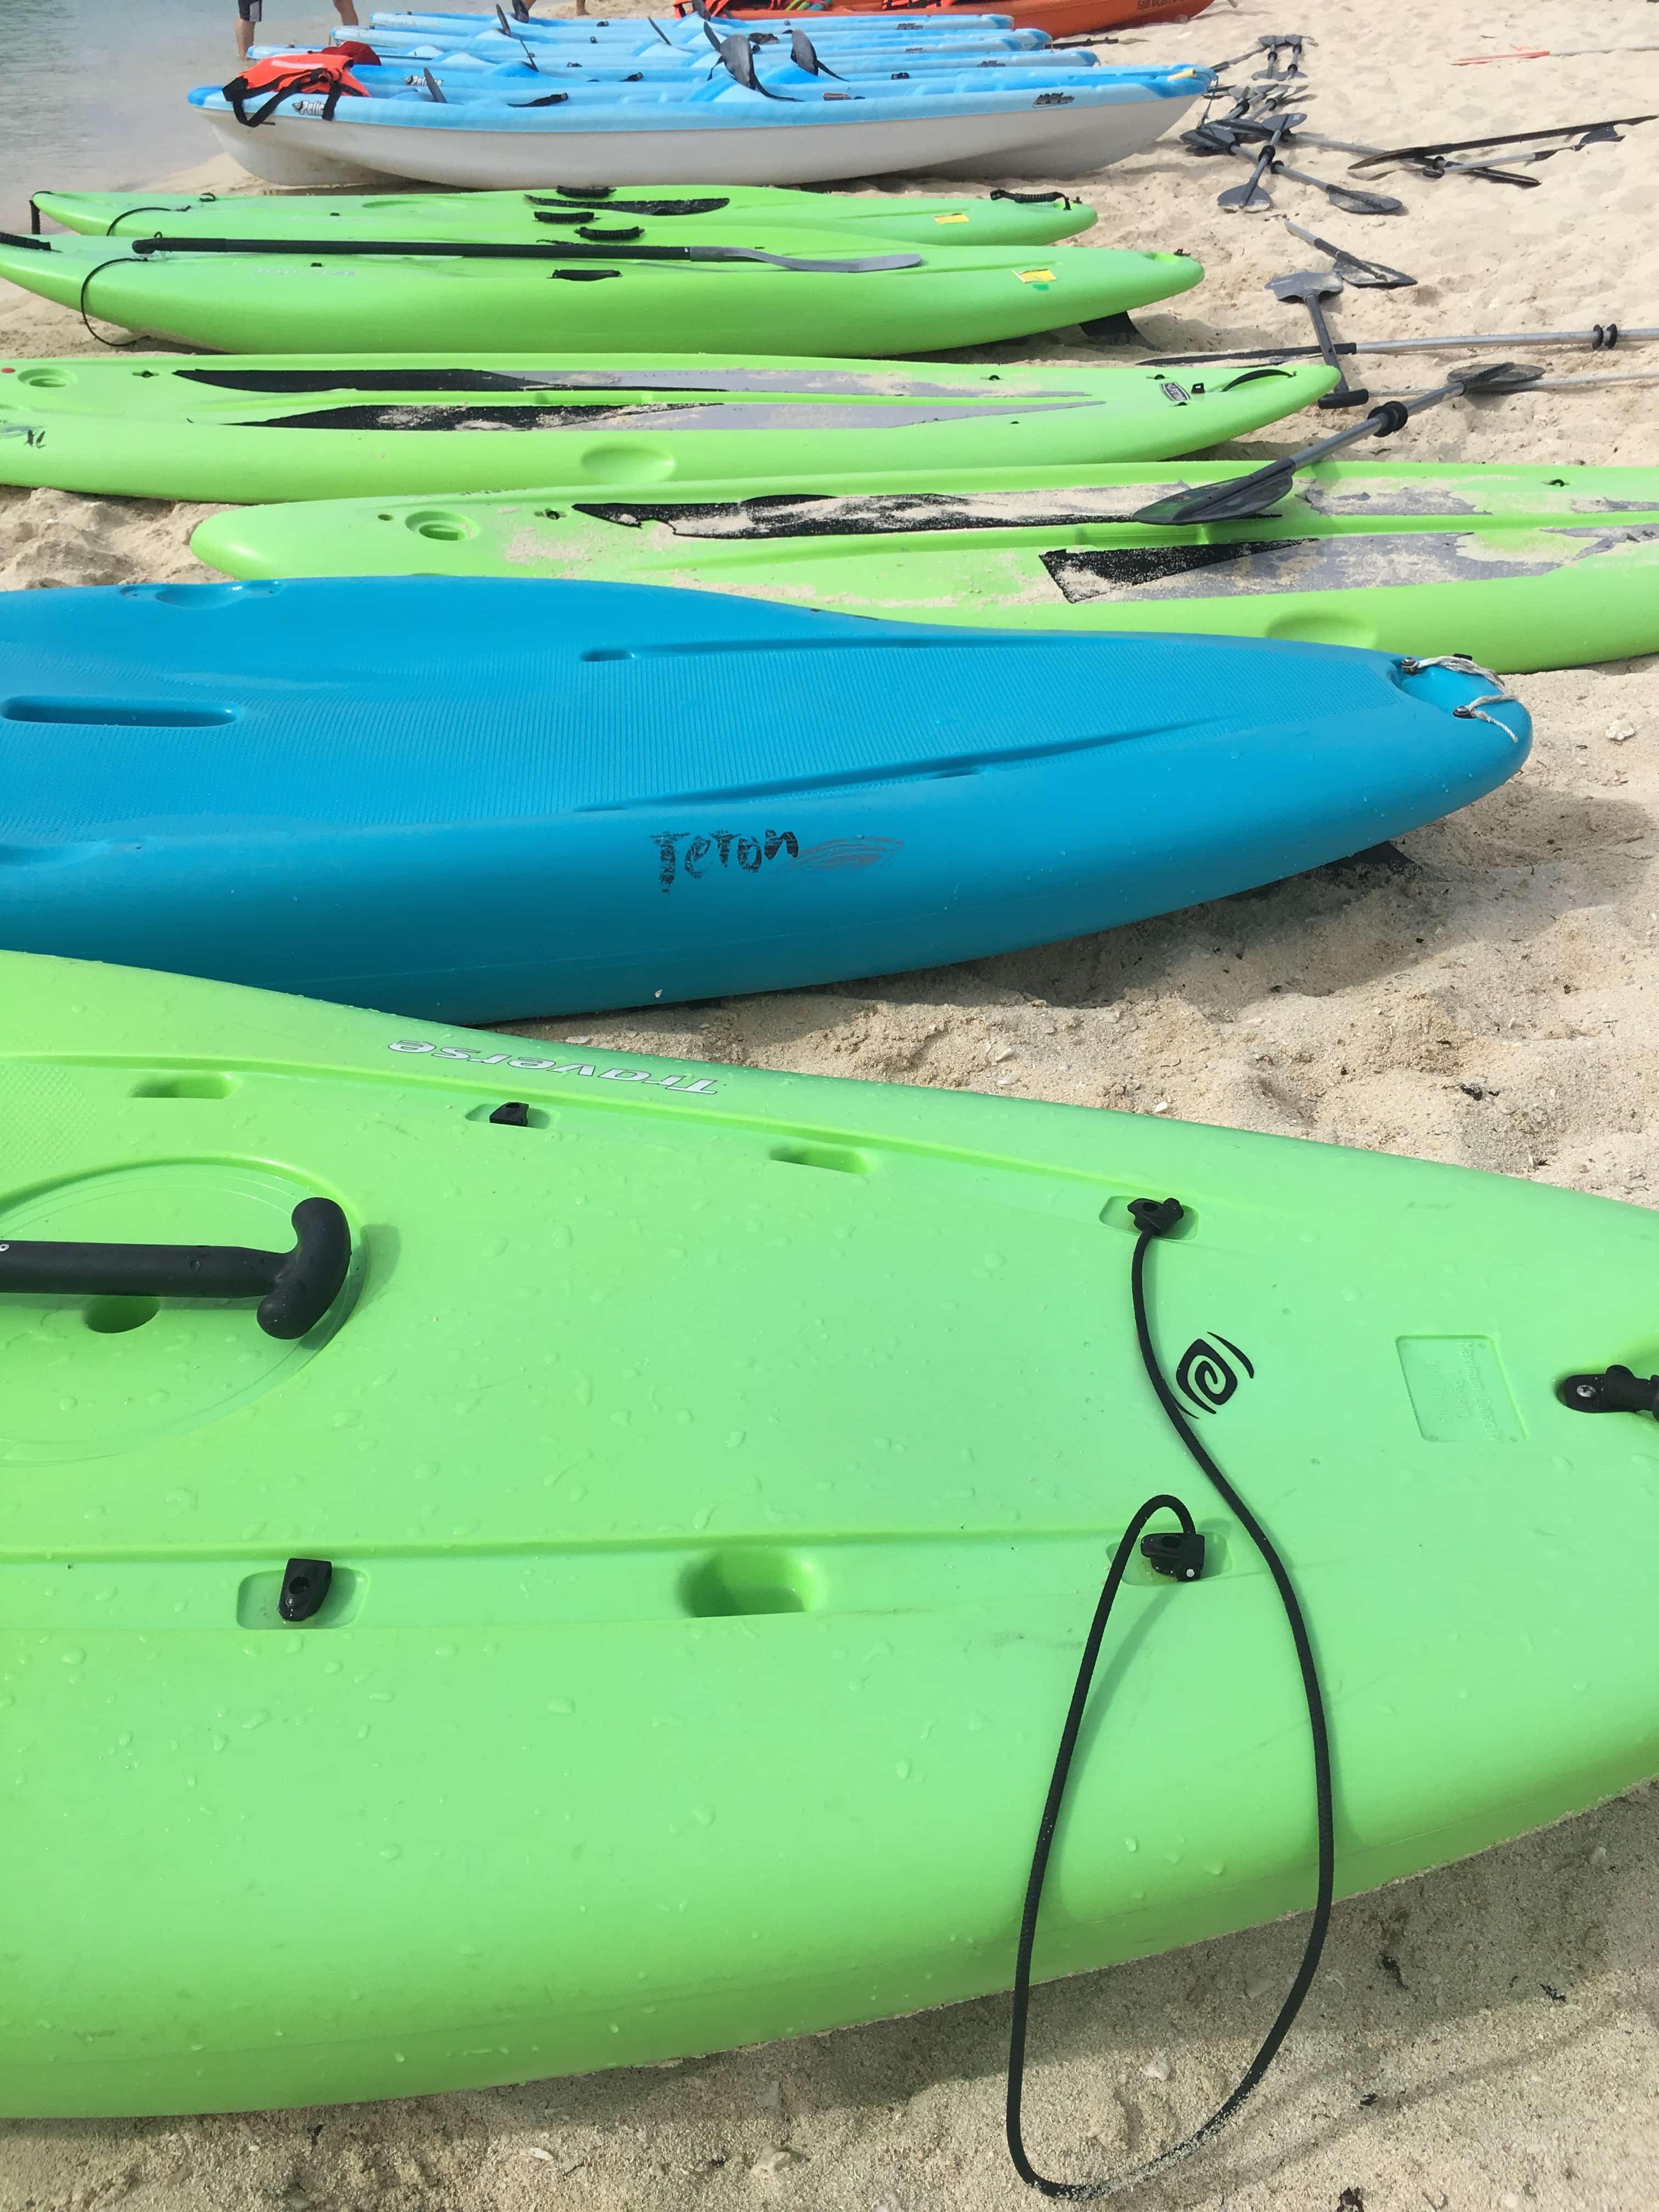 9 Reasons Cruising the Carnival Magic Good for Adults - Cozumel Paddleboard